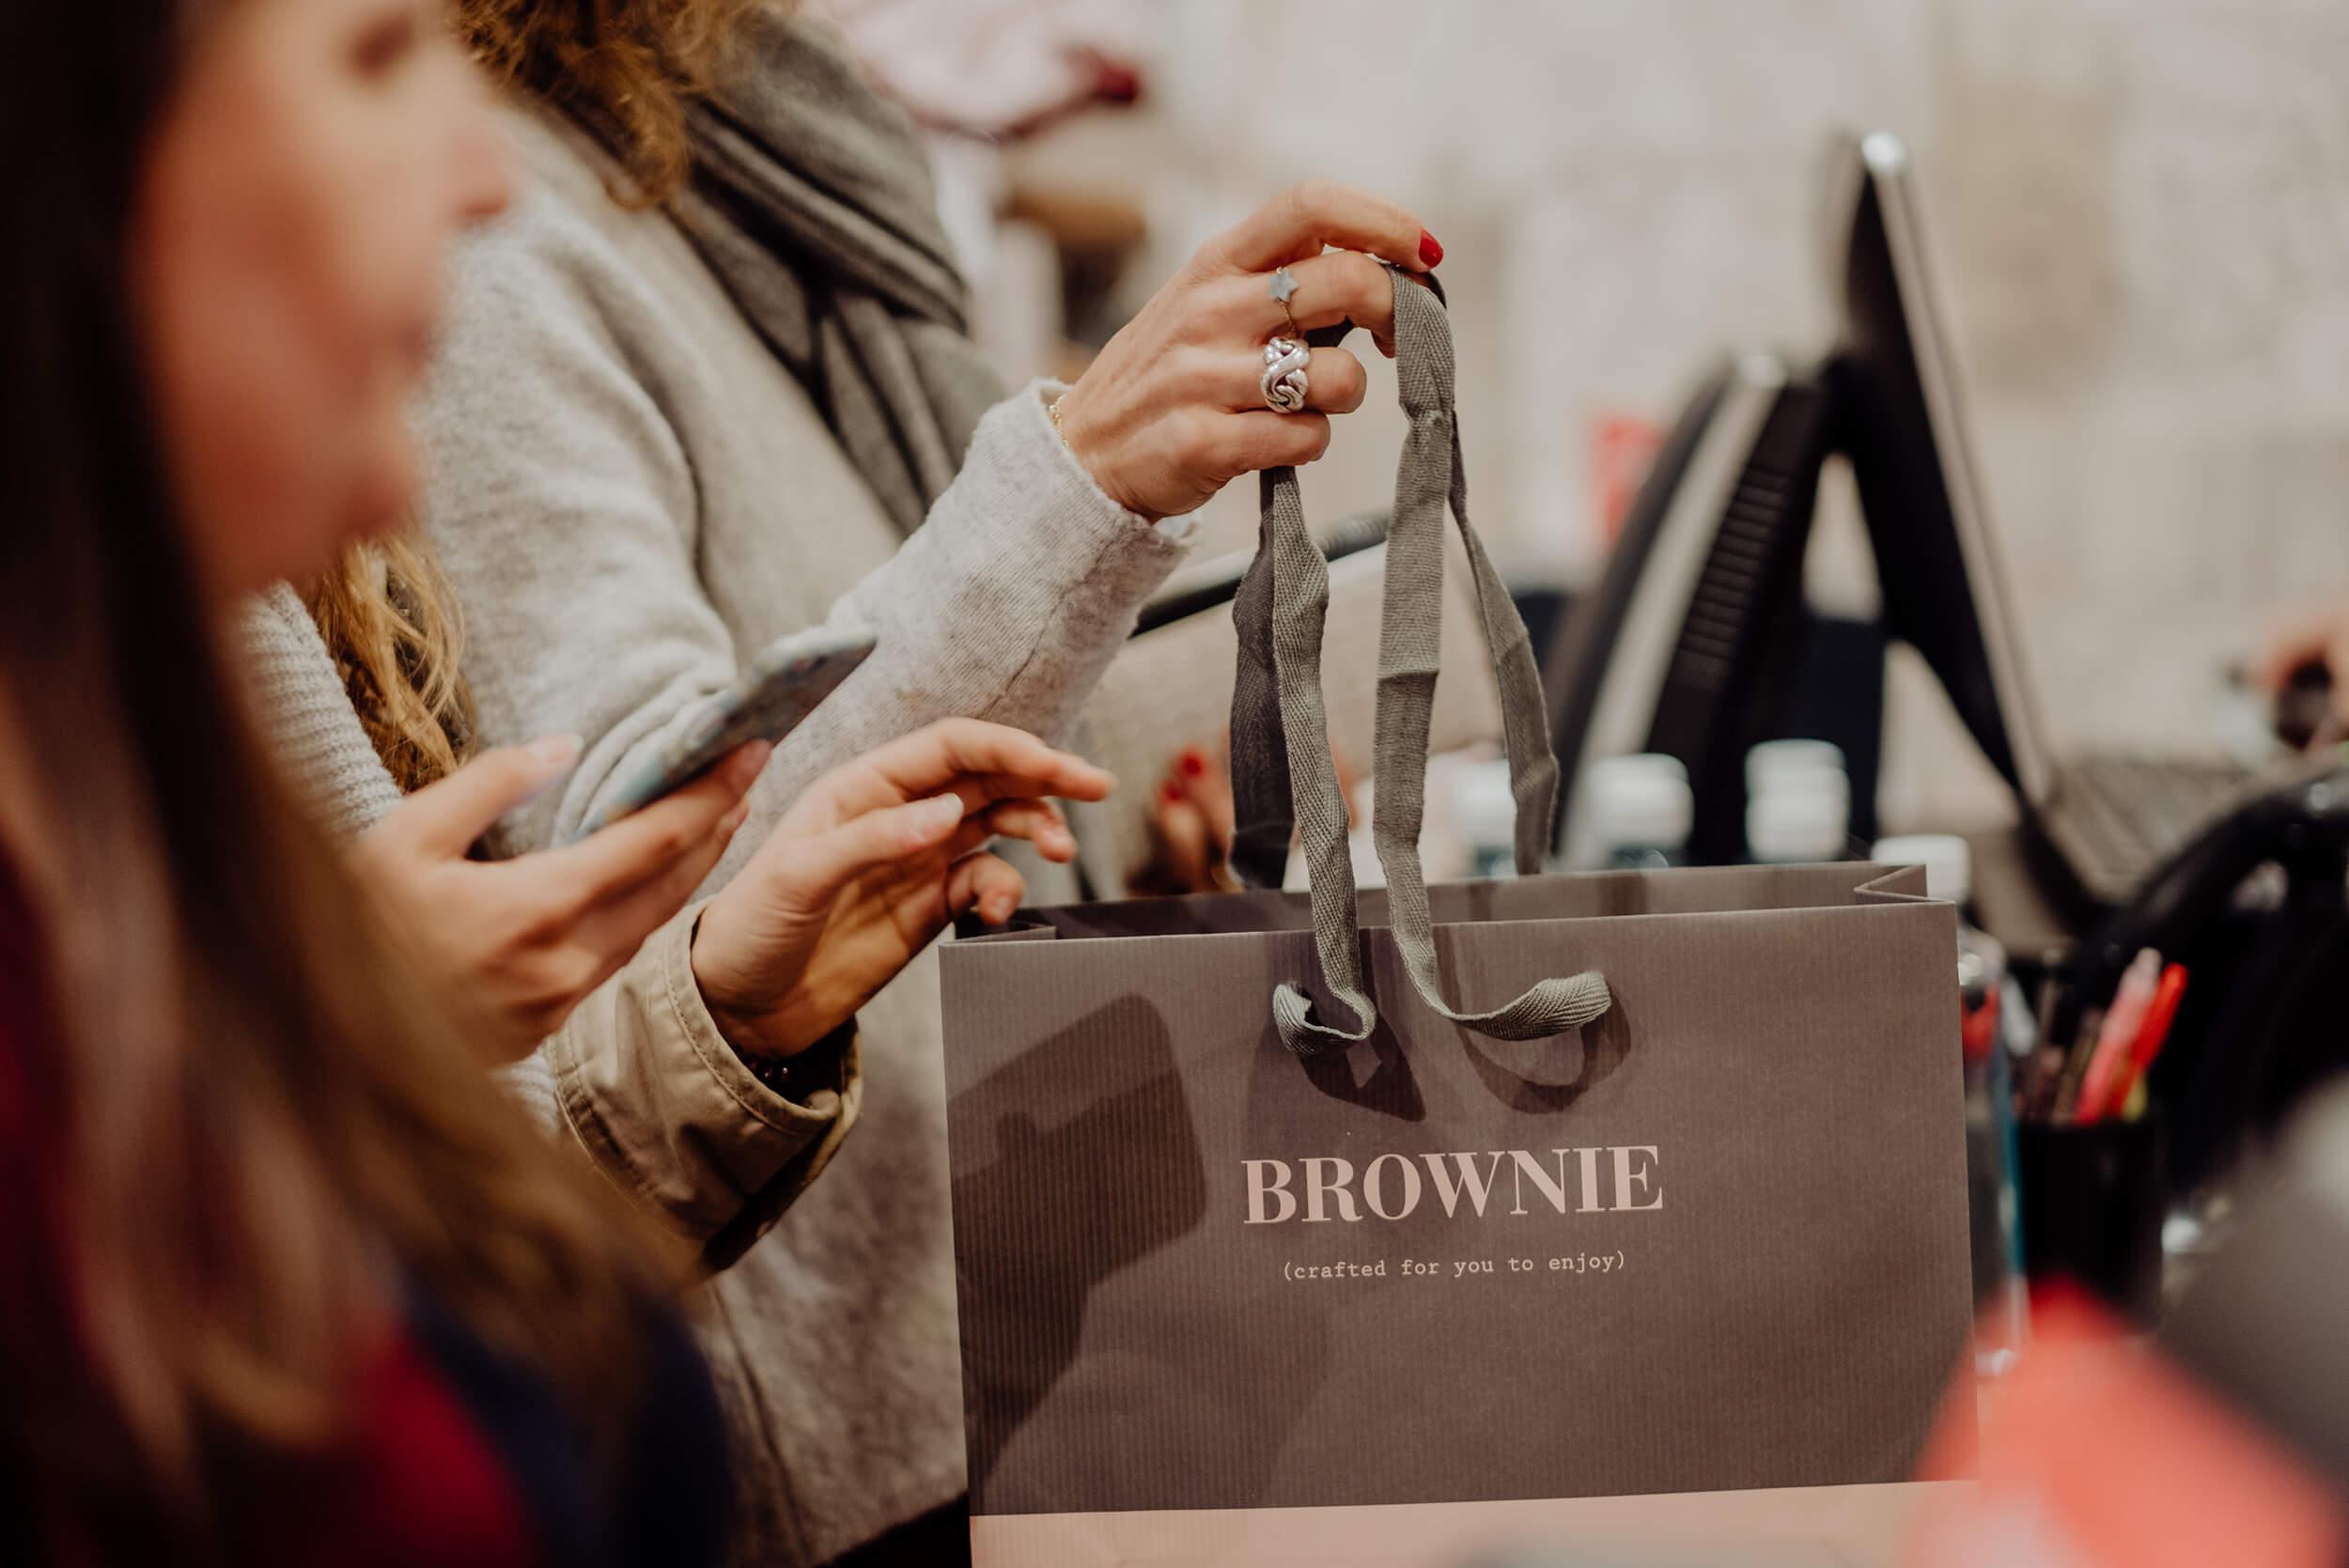 roma-organizacao-eventos-festa-de-natal-loja-brownie-69-